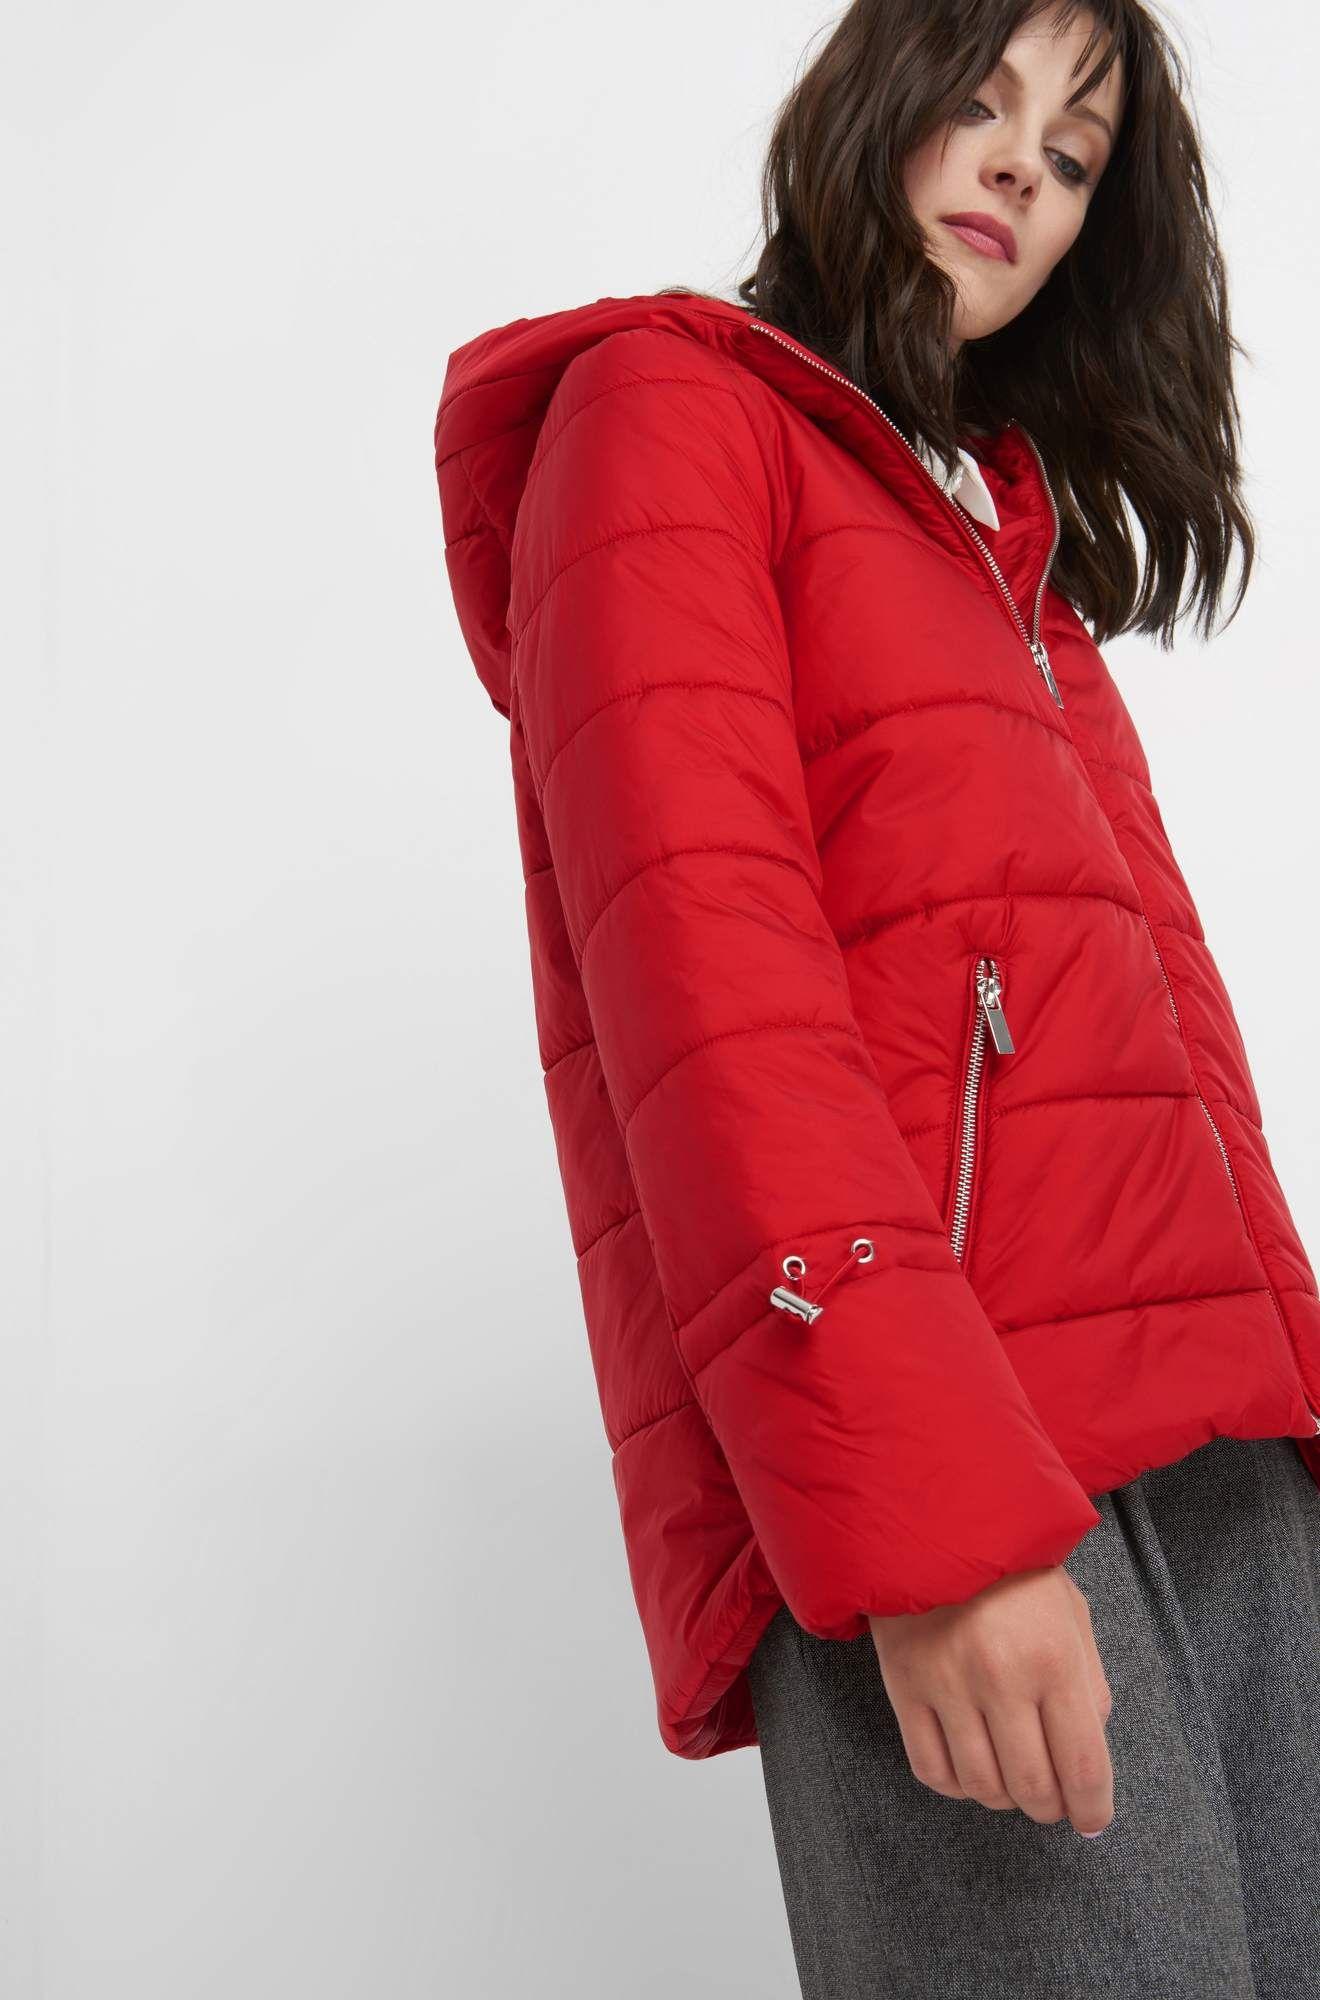 Kapuzenjacke von ORSAY | Jacken & Mäntel Damen | Winter